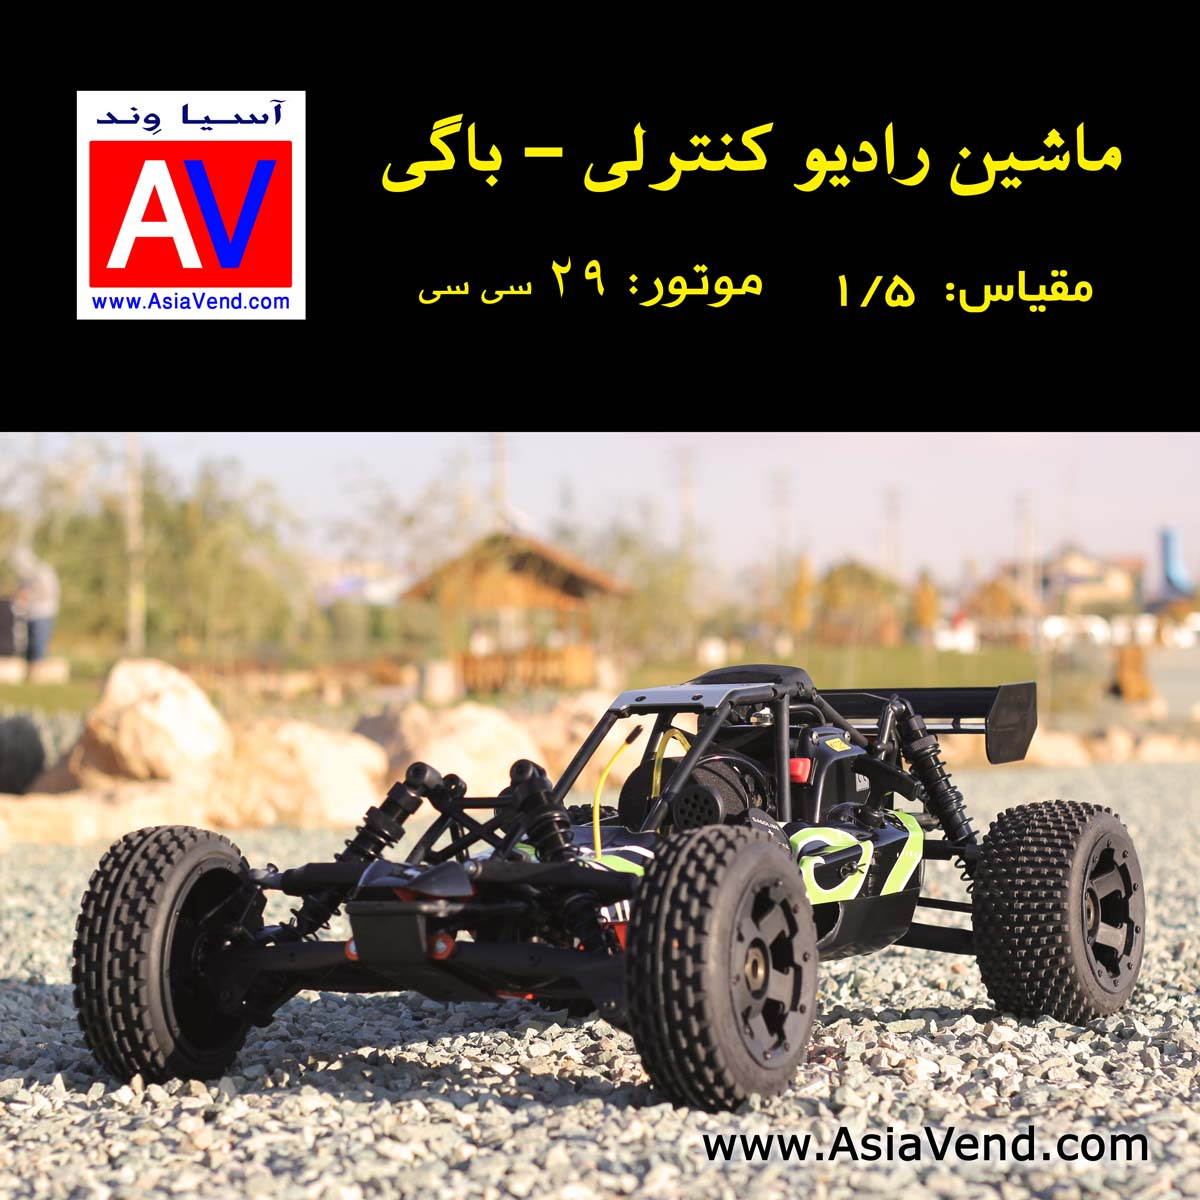 ماشین کنترلی بنزینی 1 ماشین رادیو کنترلی بنزینی آفرود BAJA RC CAR